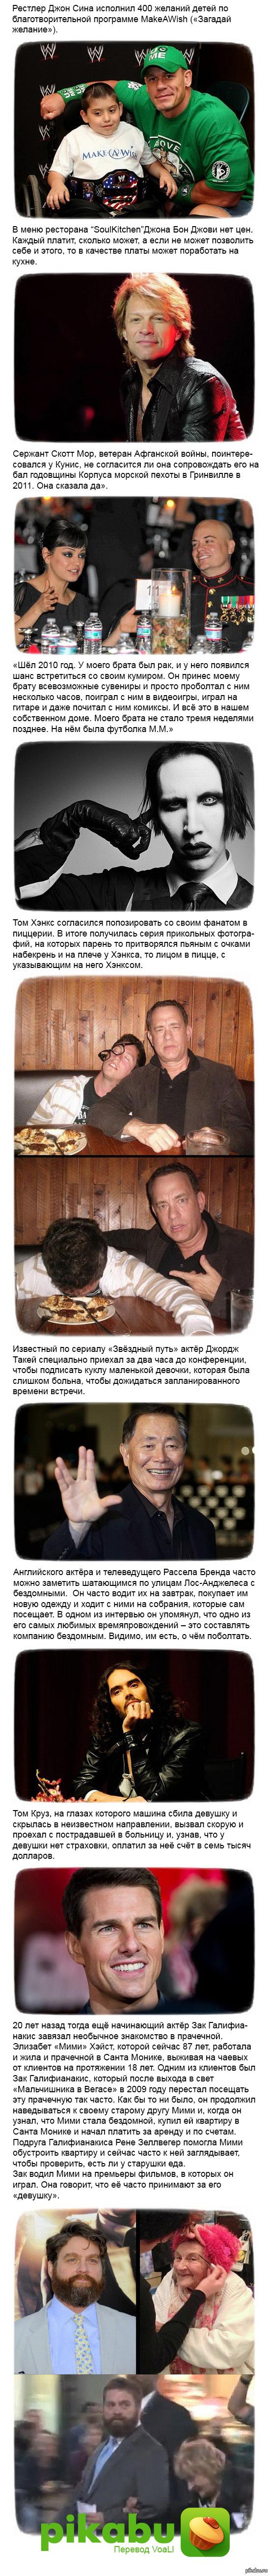 "Добрые поступки знаменитостей 2 В продолжение к <a href=""https://pikabu.ru/story/dobryie_postupki_znamenitostey_3571090"">https://pikabu.ru/story/_3571090</a>"